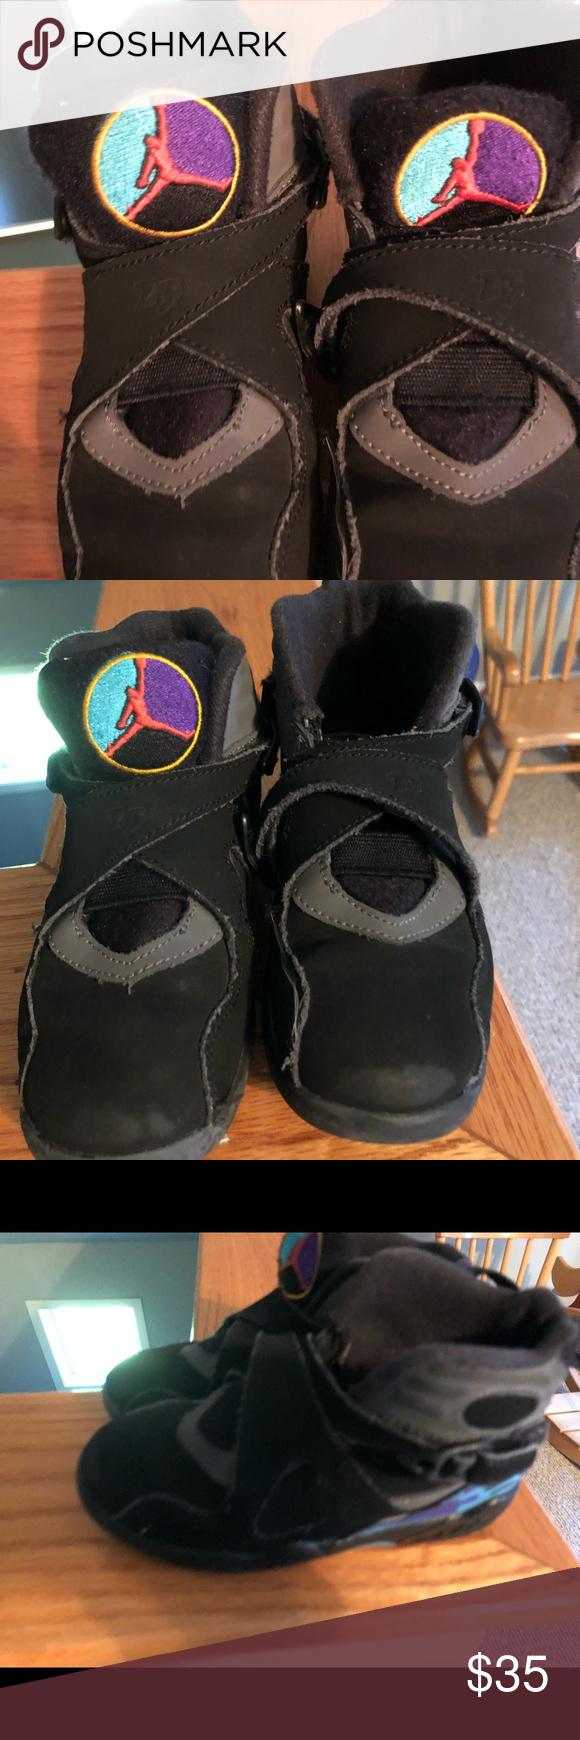 a3b31da409 Jordan 8. Size 11 little kids. Euc. nike air jordan Shoes Sneakers ...